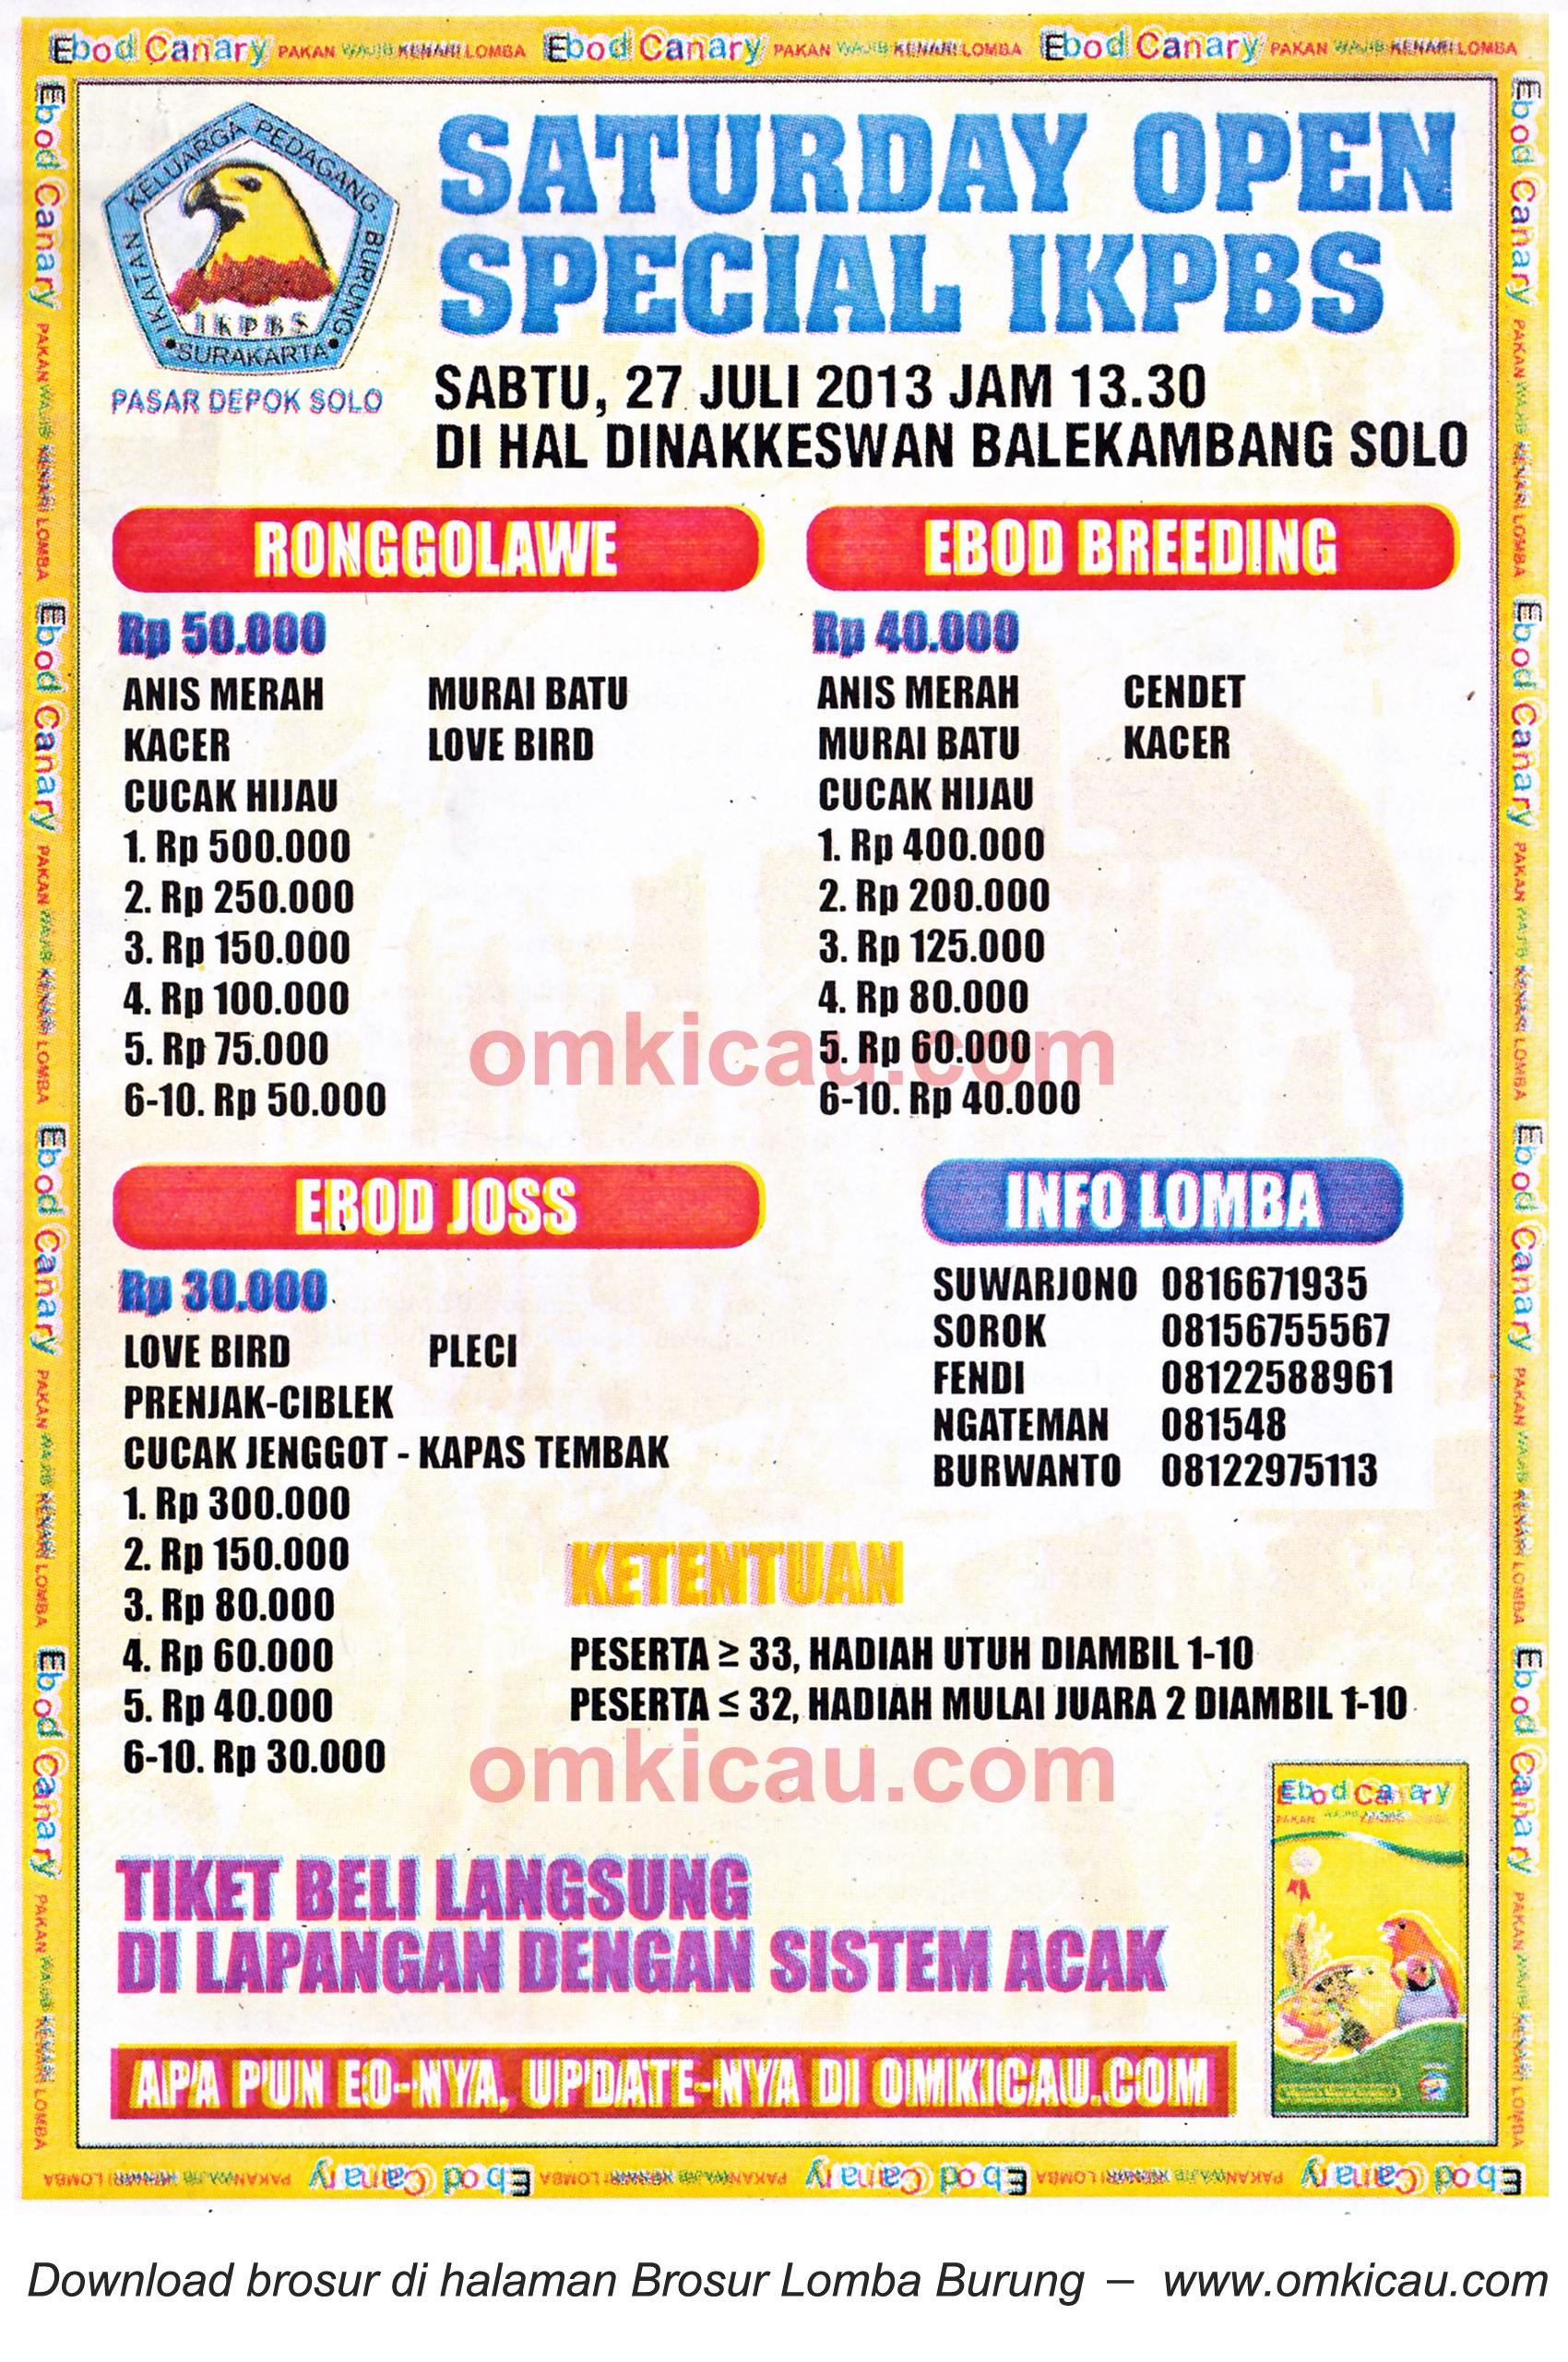 Brosur Lomba Burung Special Open IKPBS Solo 27 Juli 2013